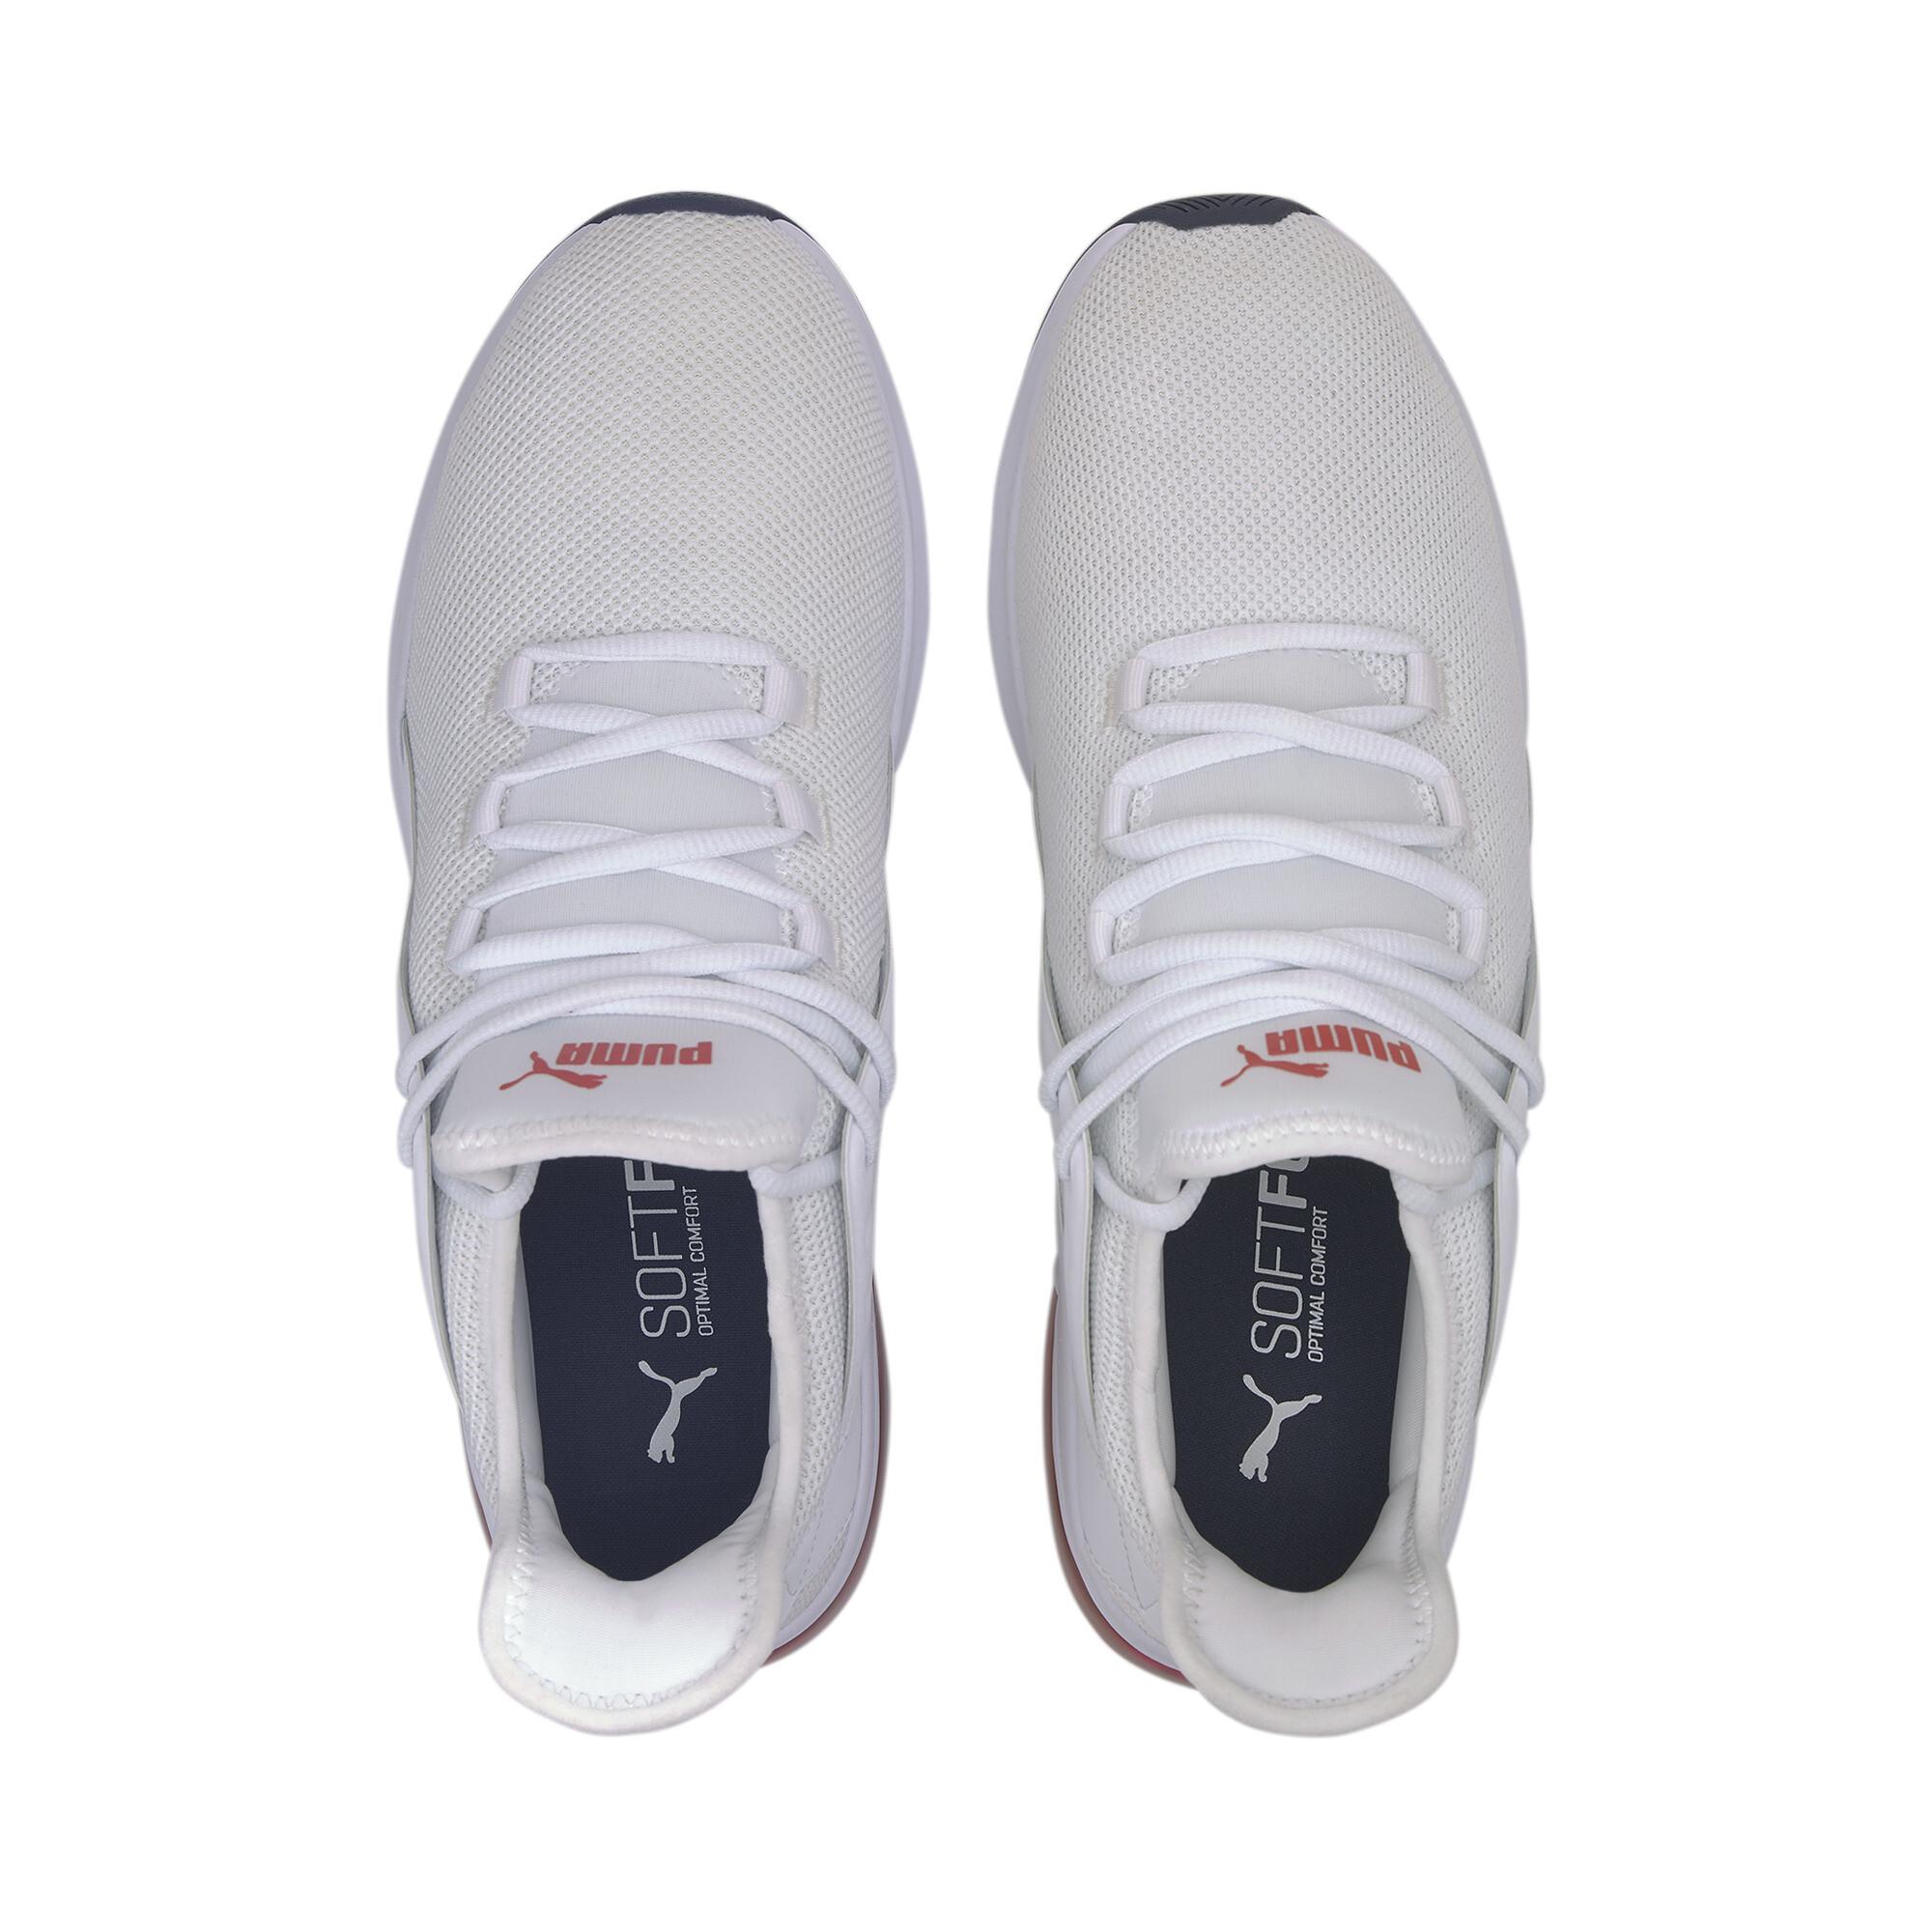 PUMA-Electron-Street-Men-039-s-Sneakers-Men-Shoe-Basics thumbnail 20